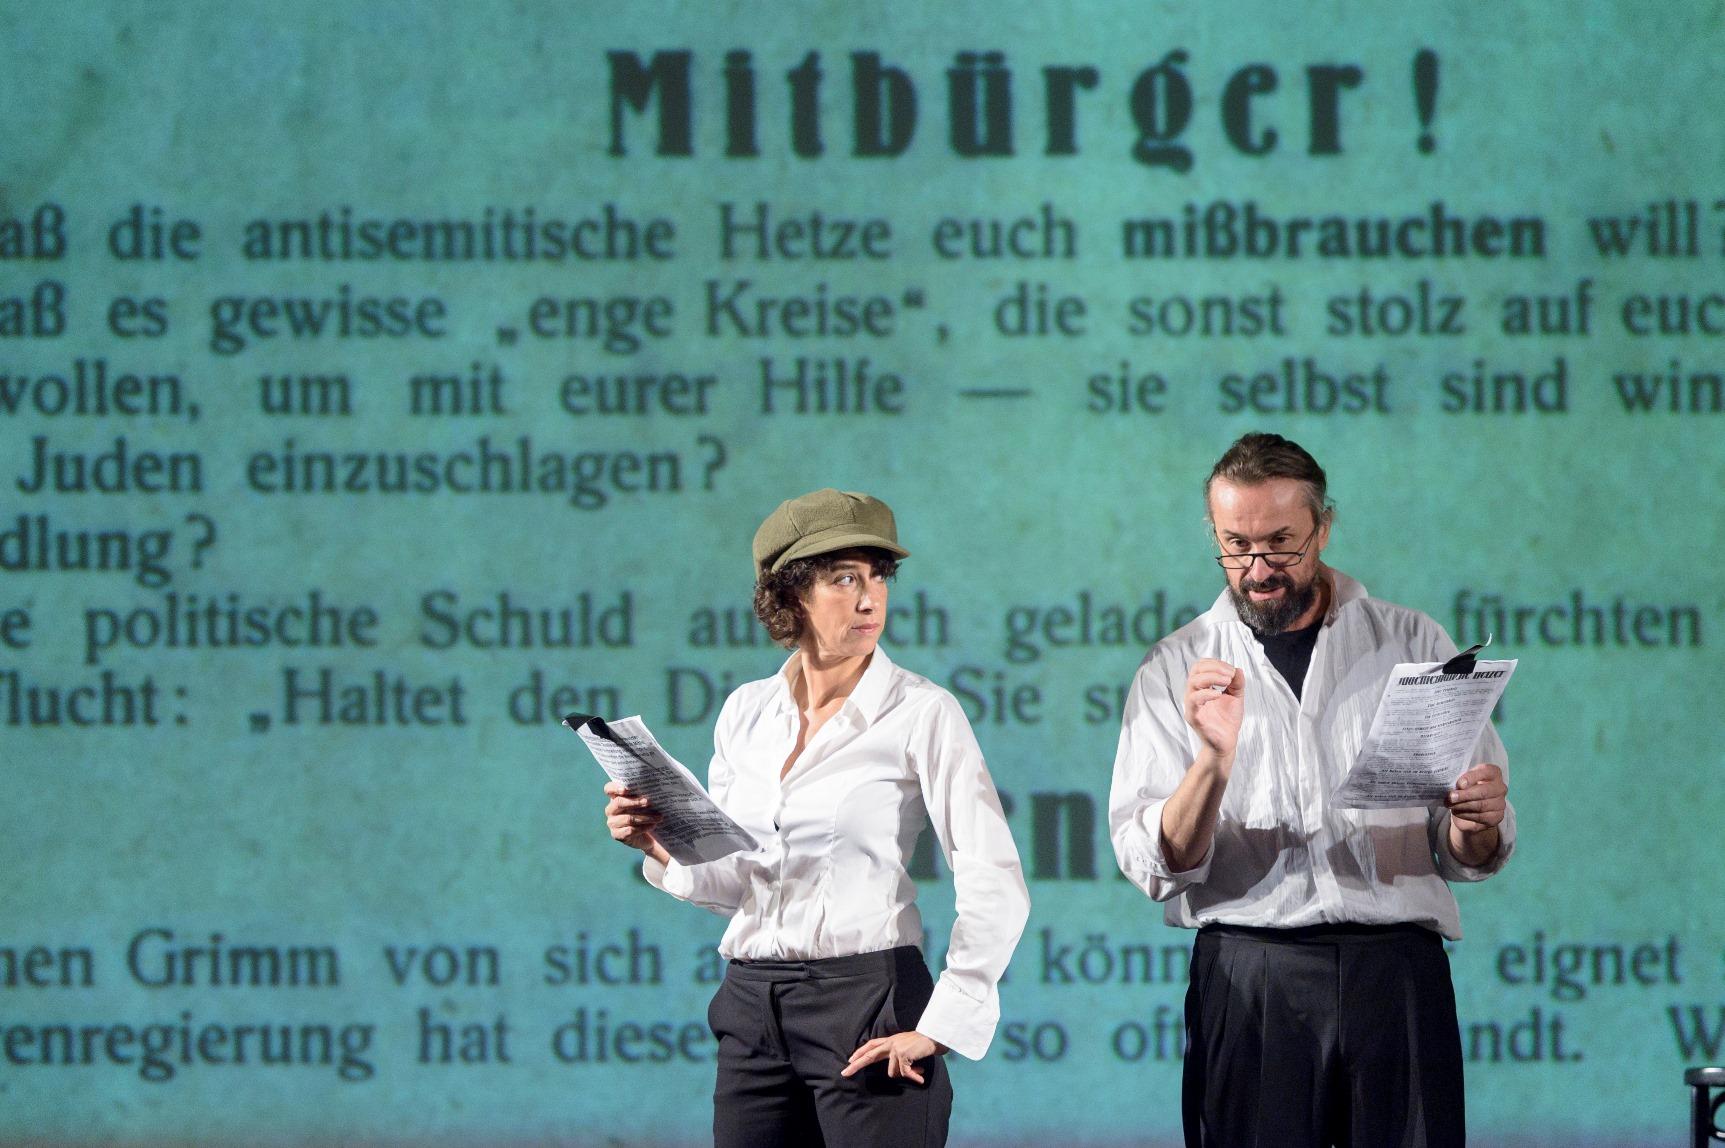 http://www.theaterwerkstatt-heidelberg.de/wp-content/uploads/2016/07/Geflu%CC%88chtet-Unerwu%CC%88nscht-13.jpg